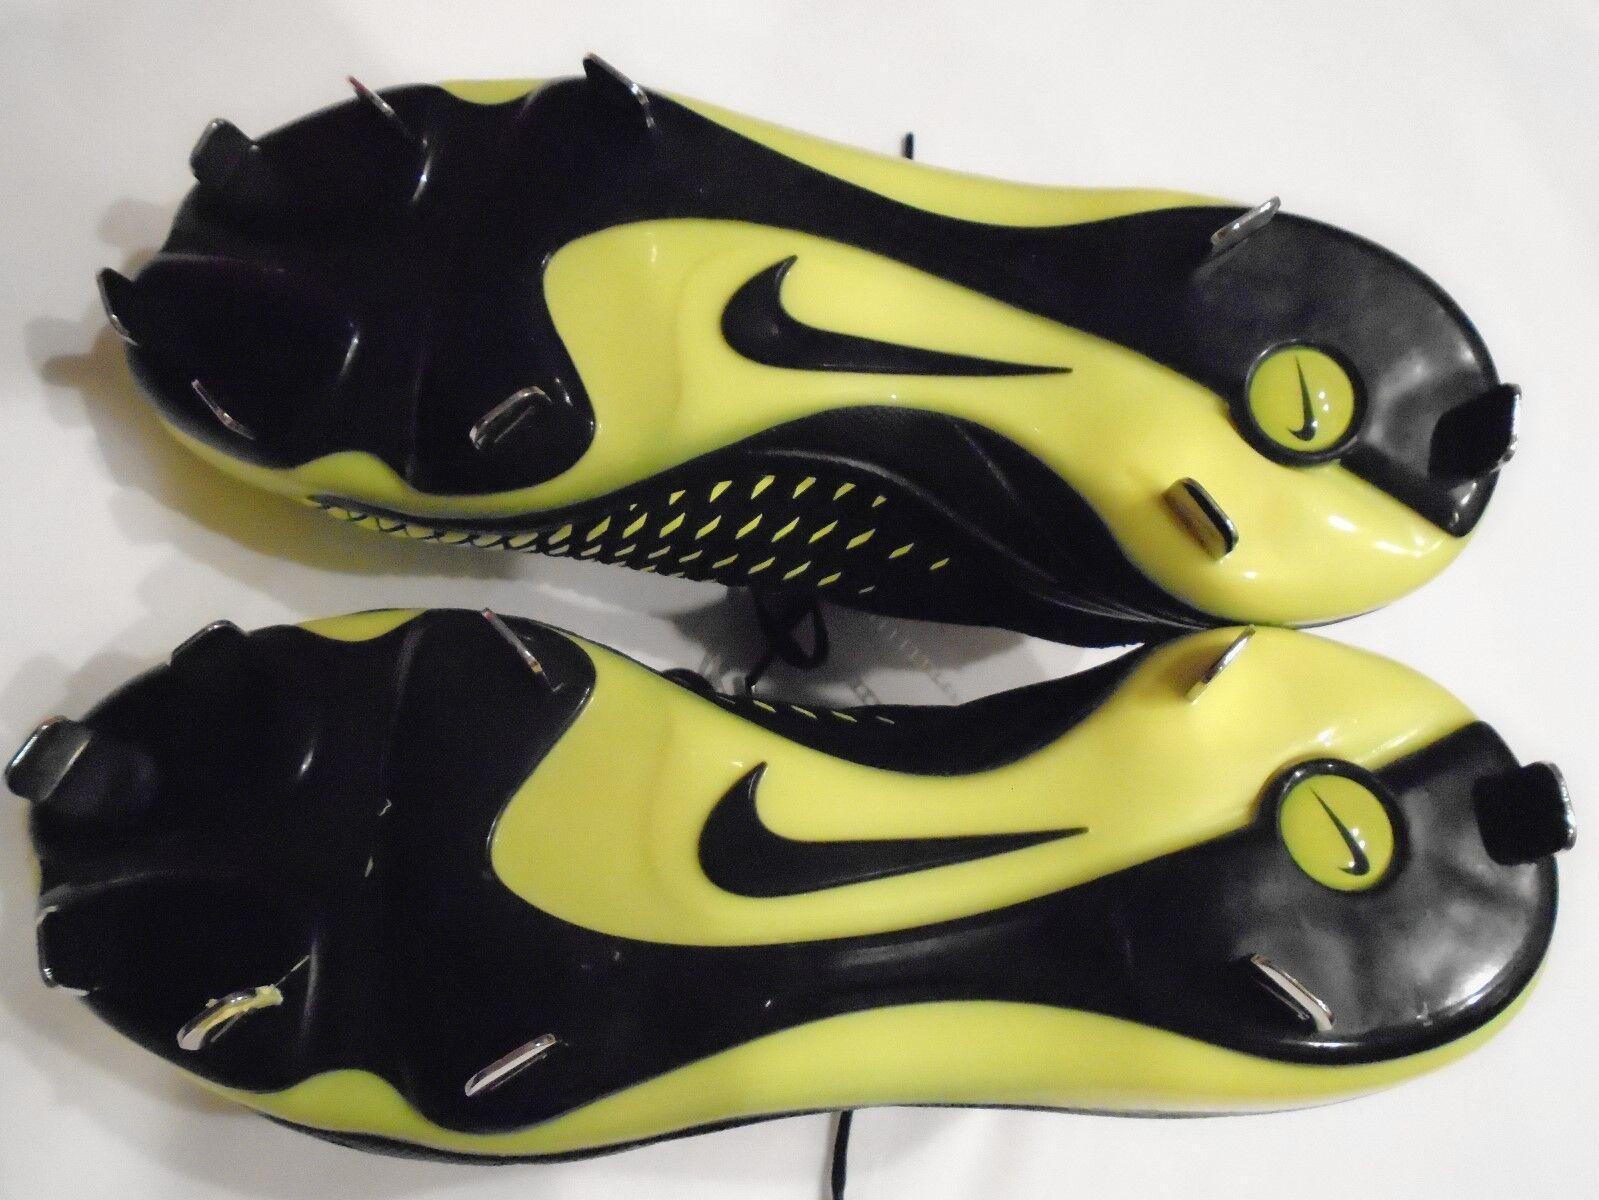 Nike Maschile Di Aria Nuova Trota  2 Pro Basso Metal  Trota  Da Baseball 6d6075